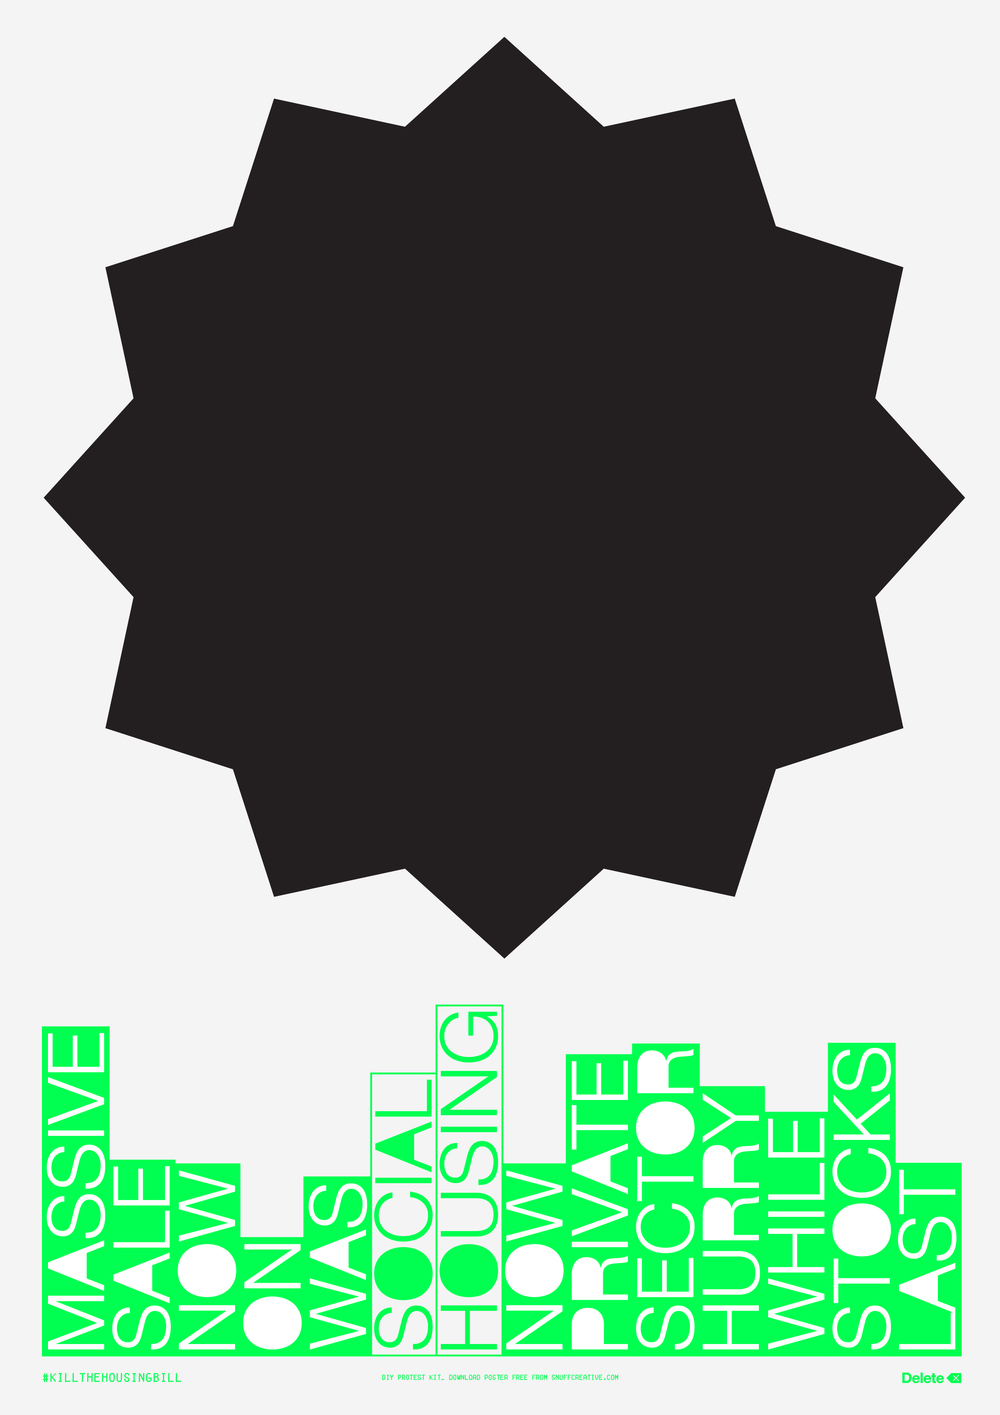 MASSIVE SALE TYPE POSTER_BLACK&GREY1-03.jpg